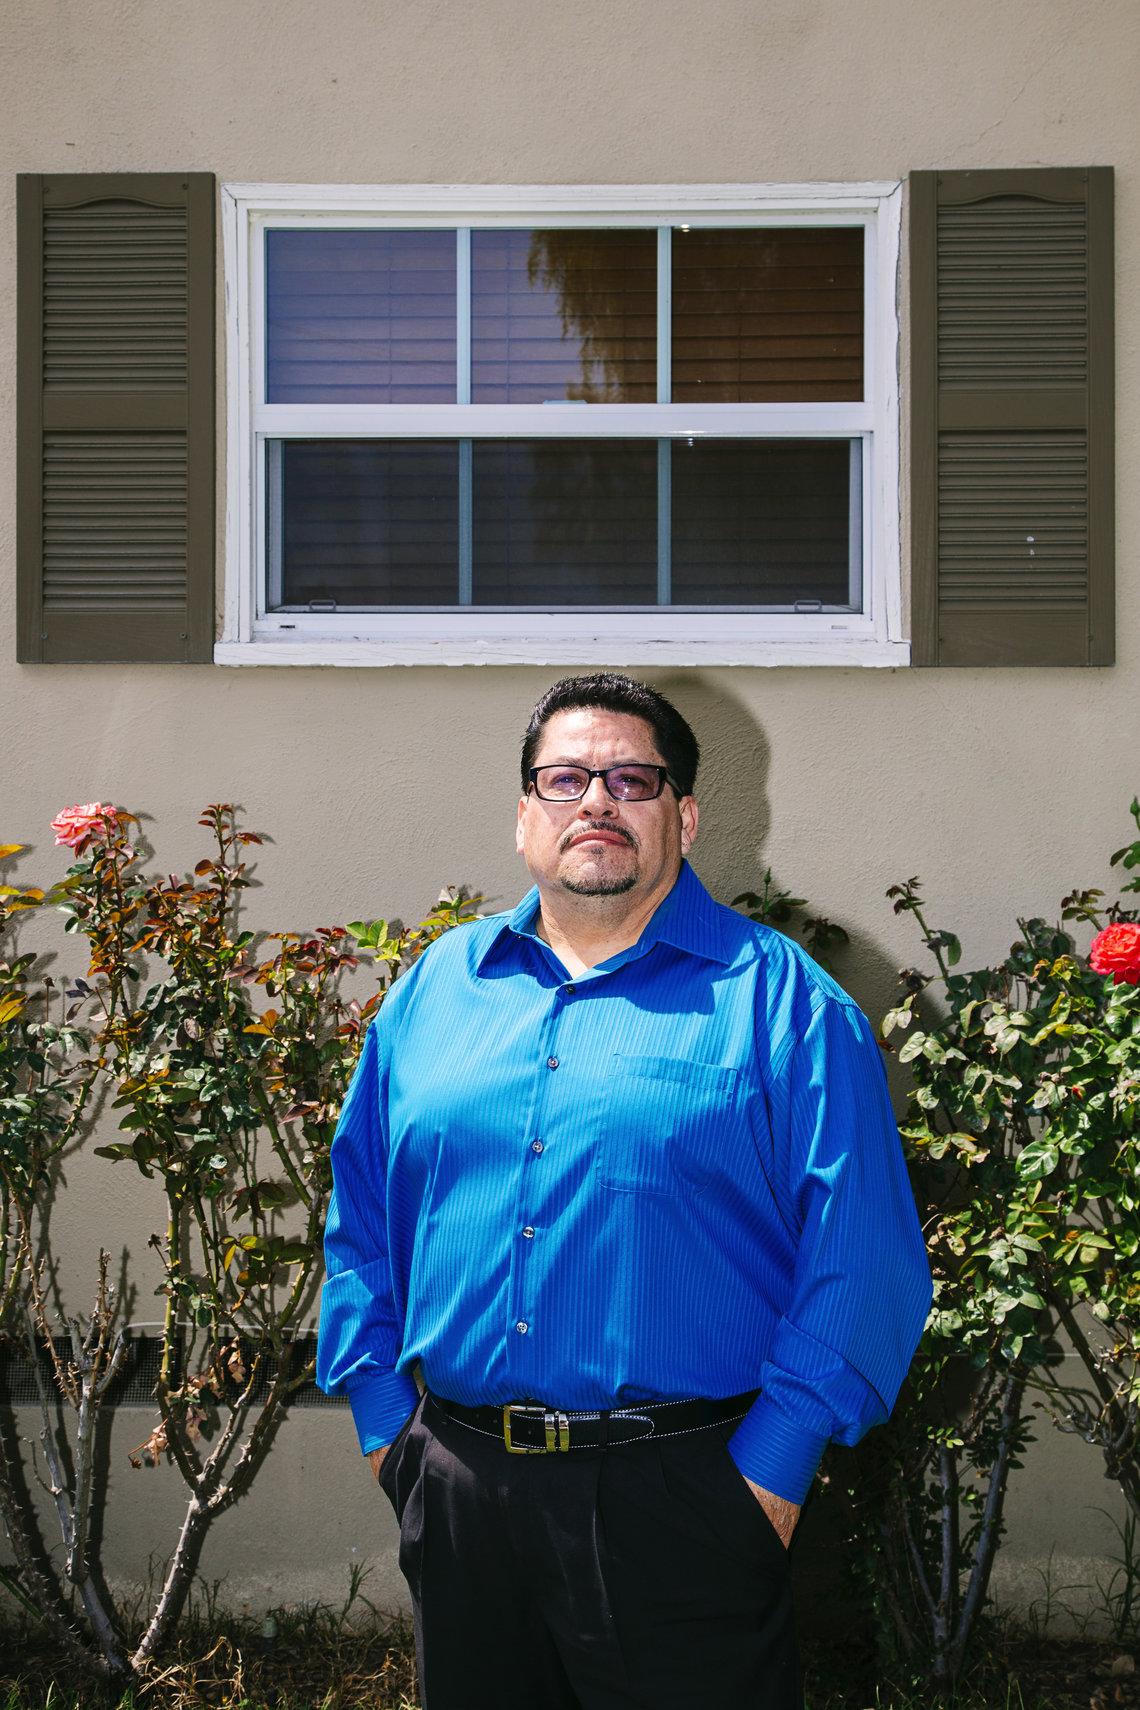 Richard Ortega, former halfway house director for the CEC, at his home in San Bernardino.